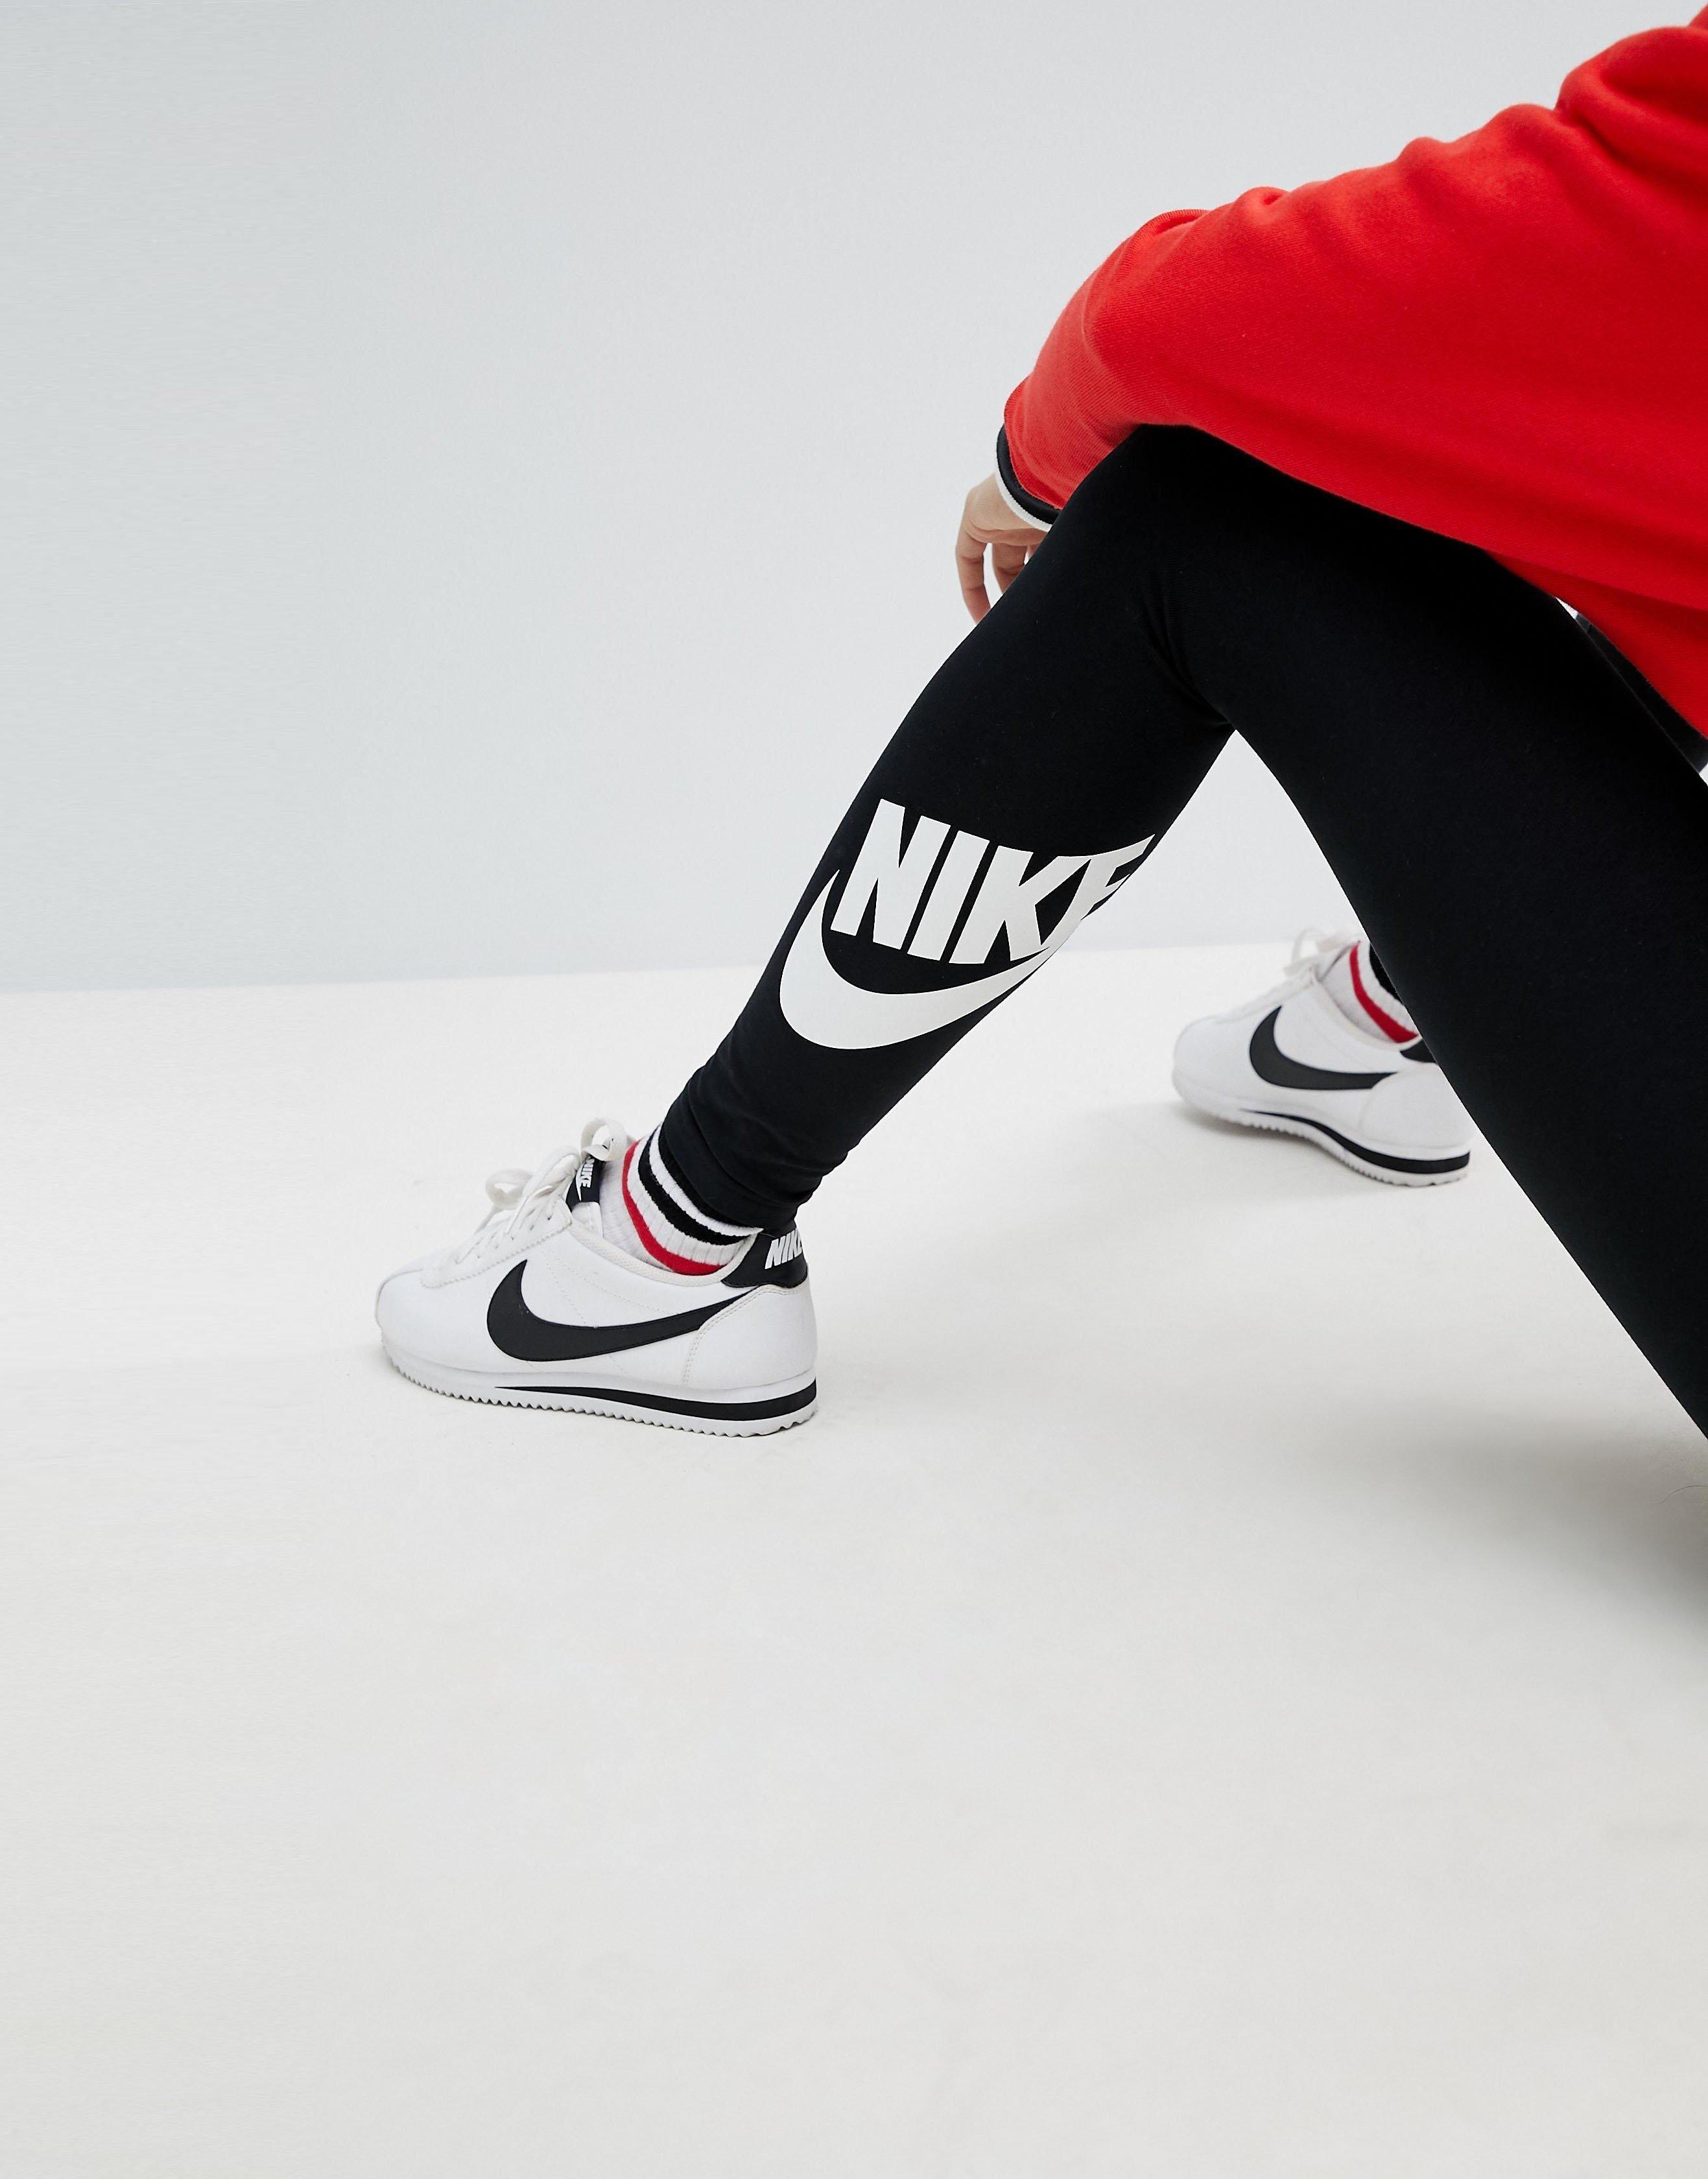 Nike☆スウッシュ Swoosh 裾ロゴ レギンスカラー写真02